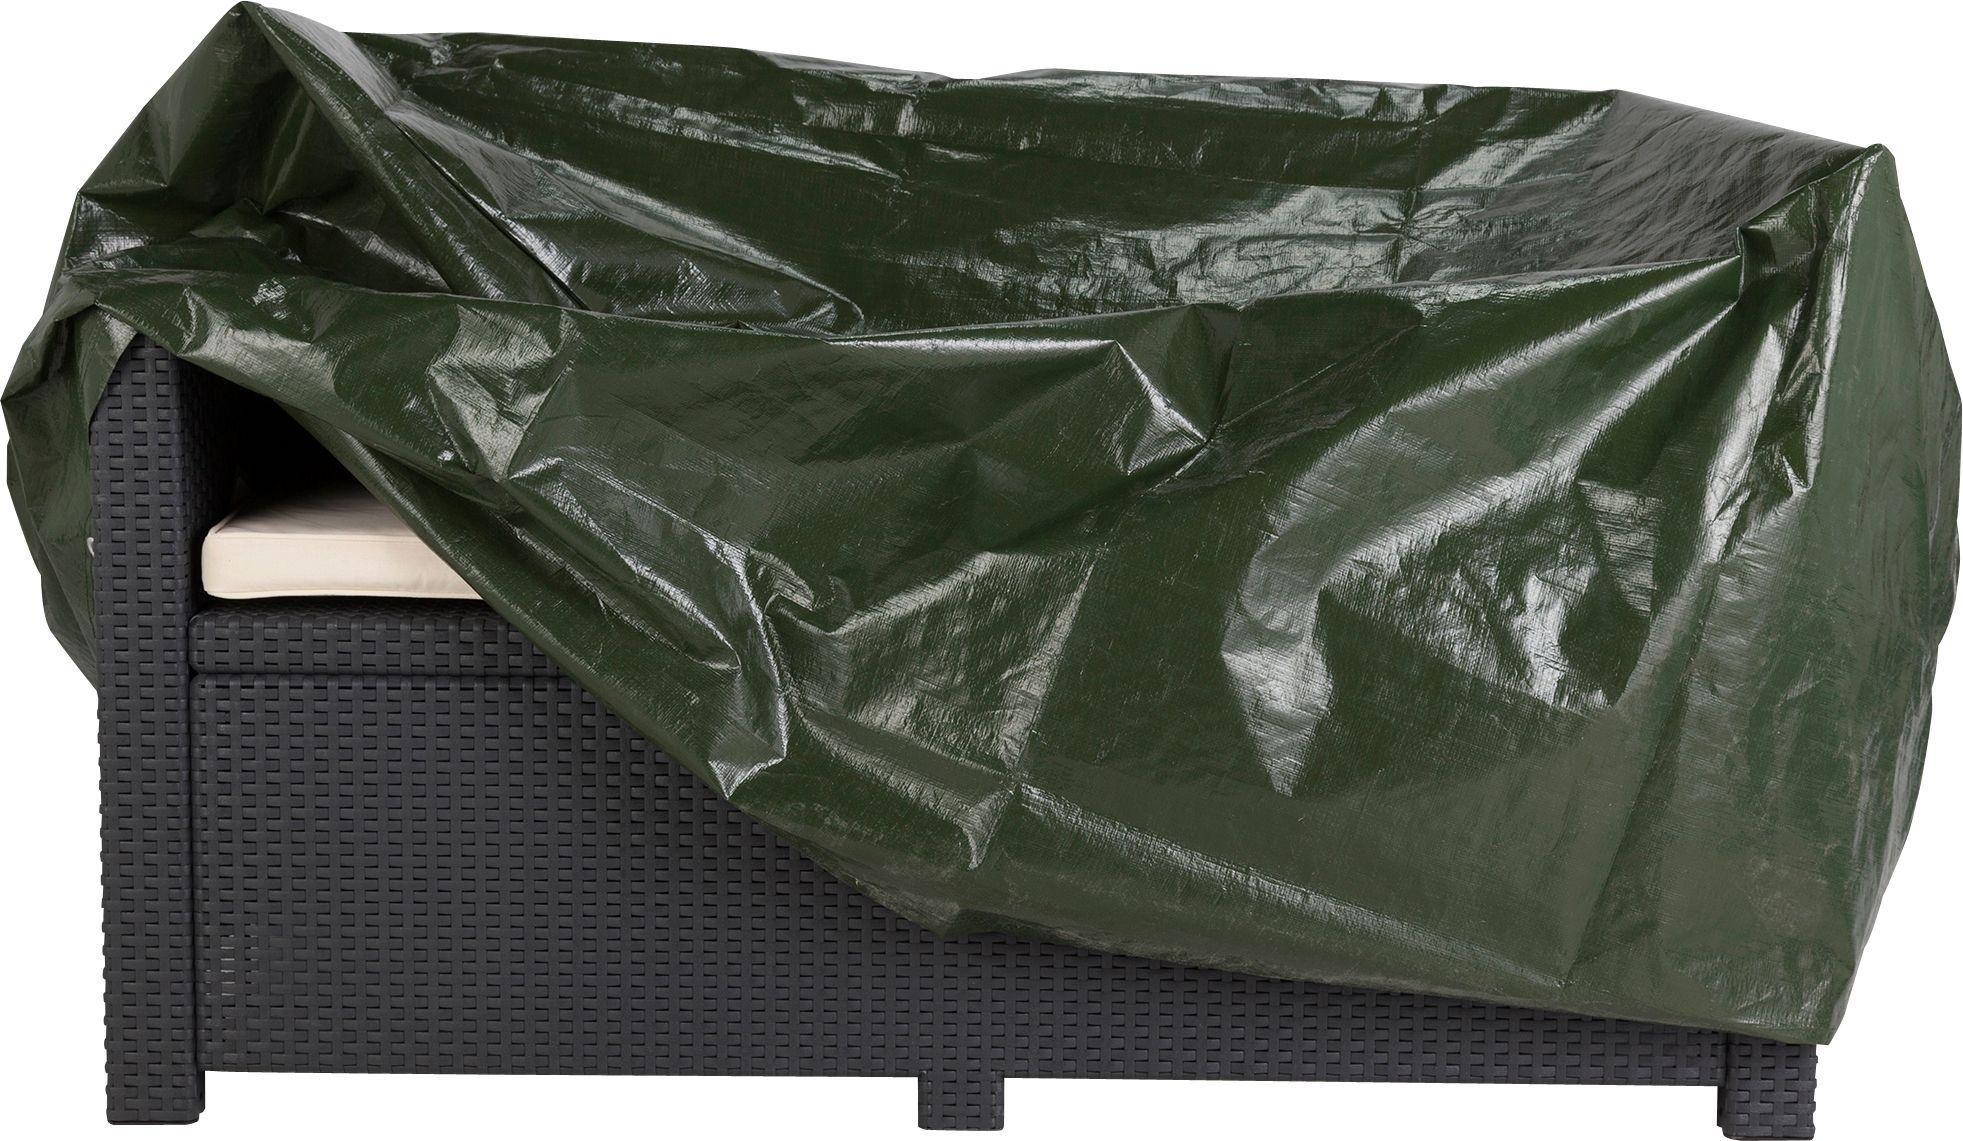 Argos Home Standard Rattan Garden Chair Cover   Set Of 2